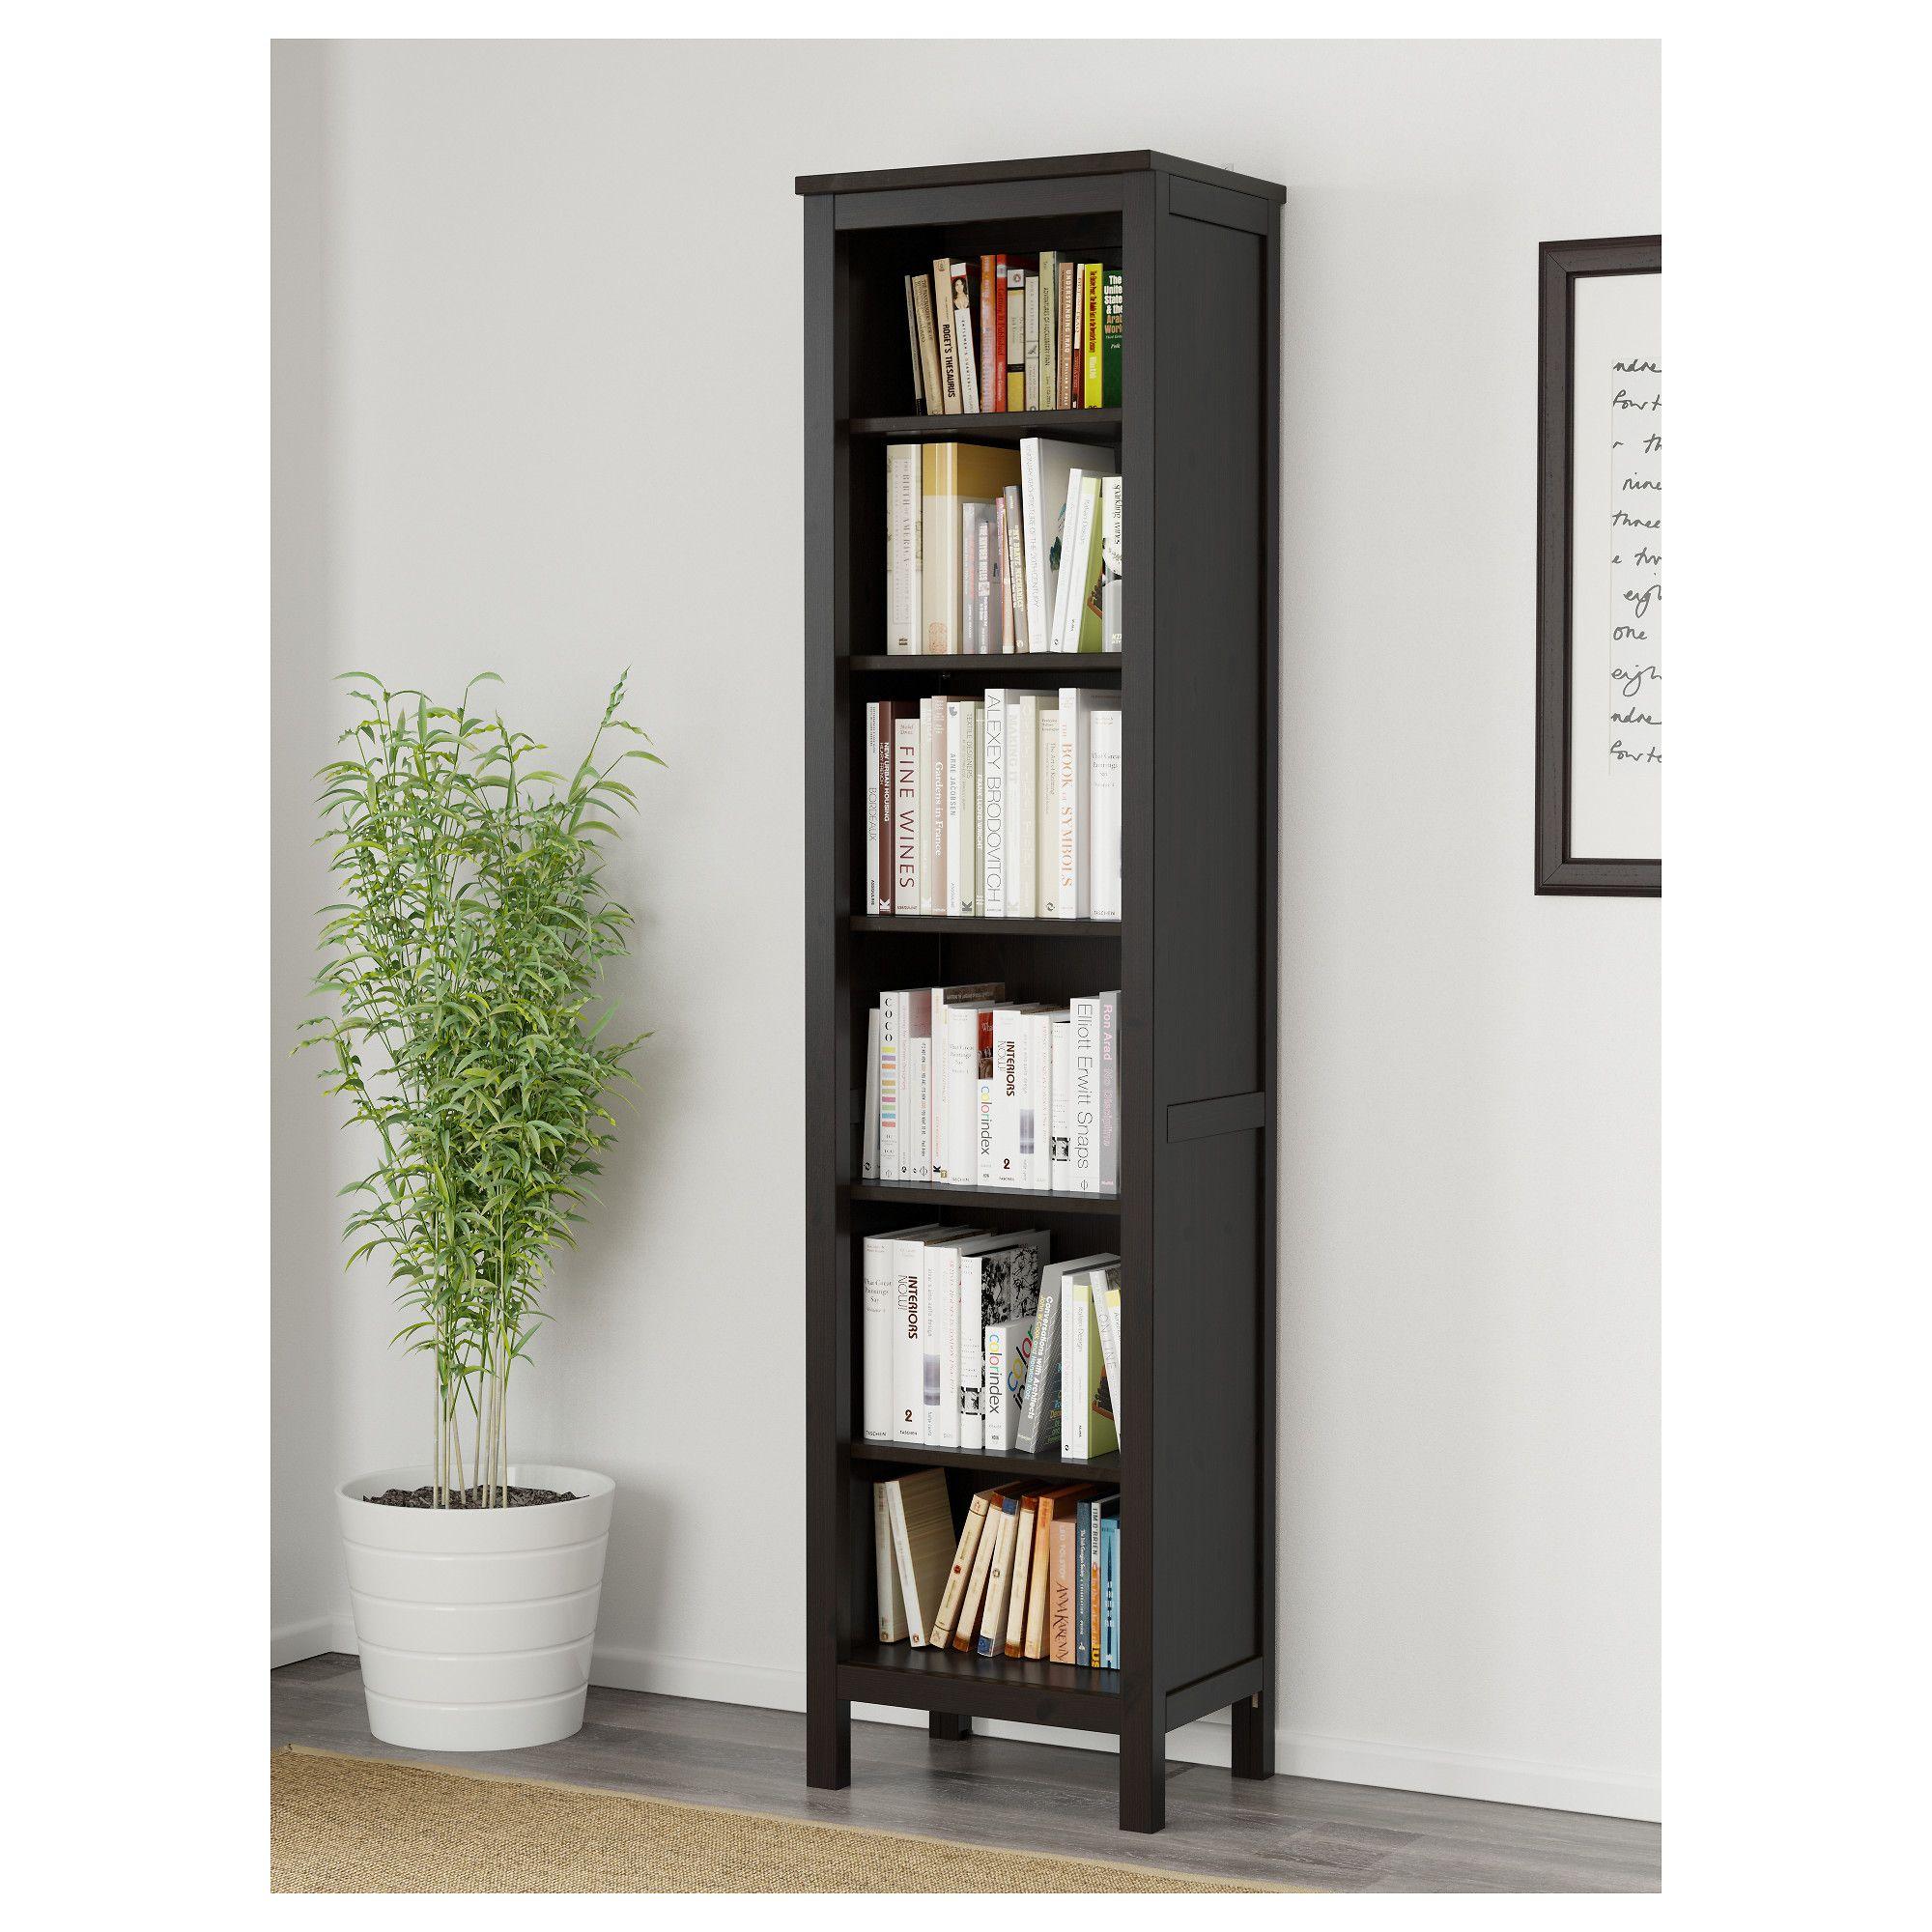 IKEA HEMNES bookcase Solid wood has a natural feel 1 fixed shelf